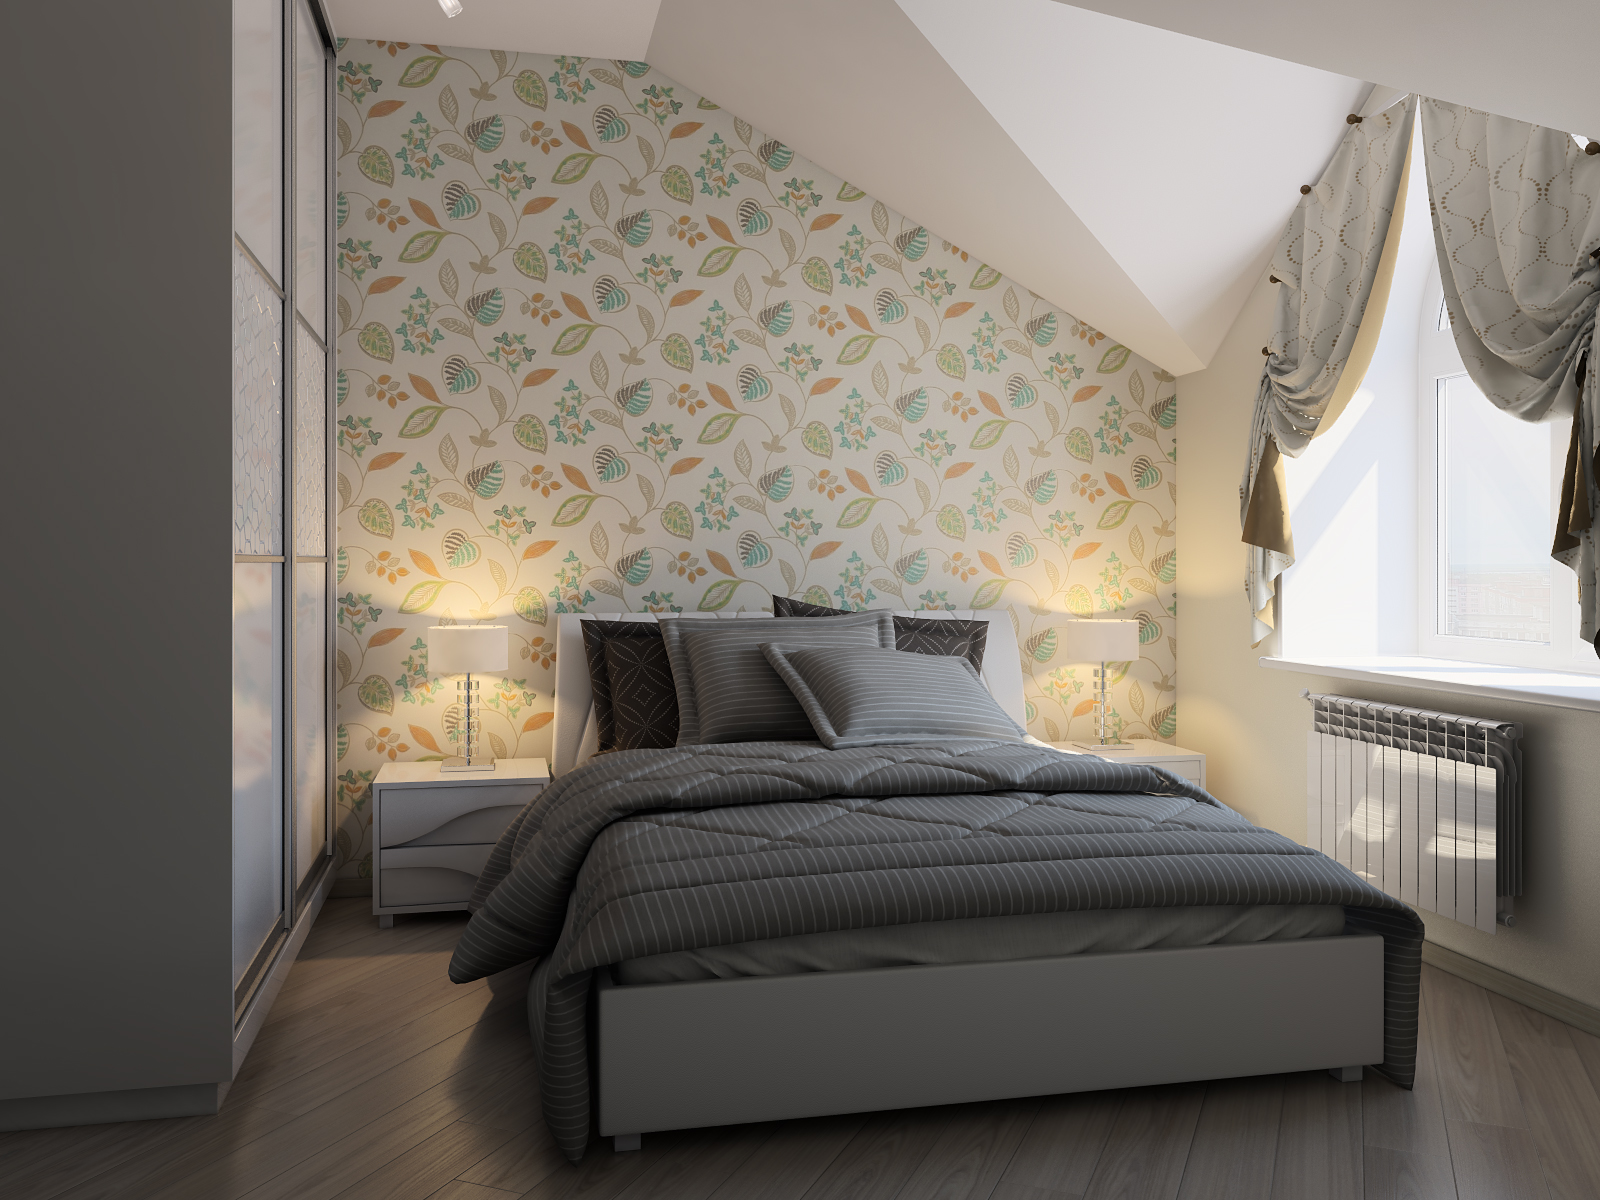 дизайн спальной комнаты на мансарде